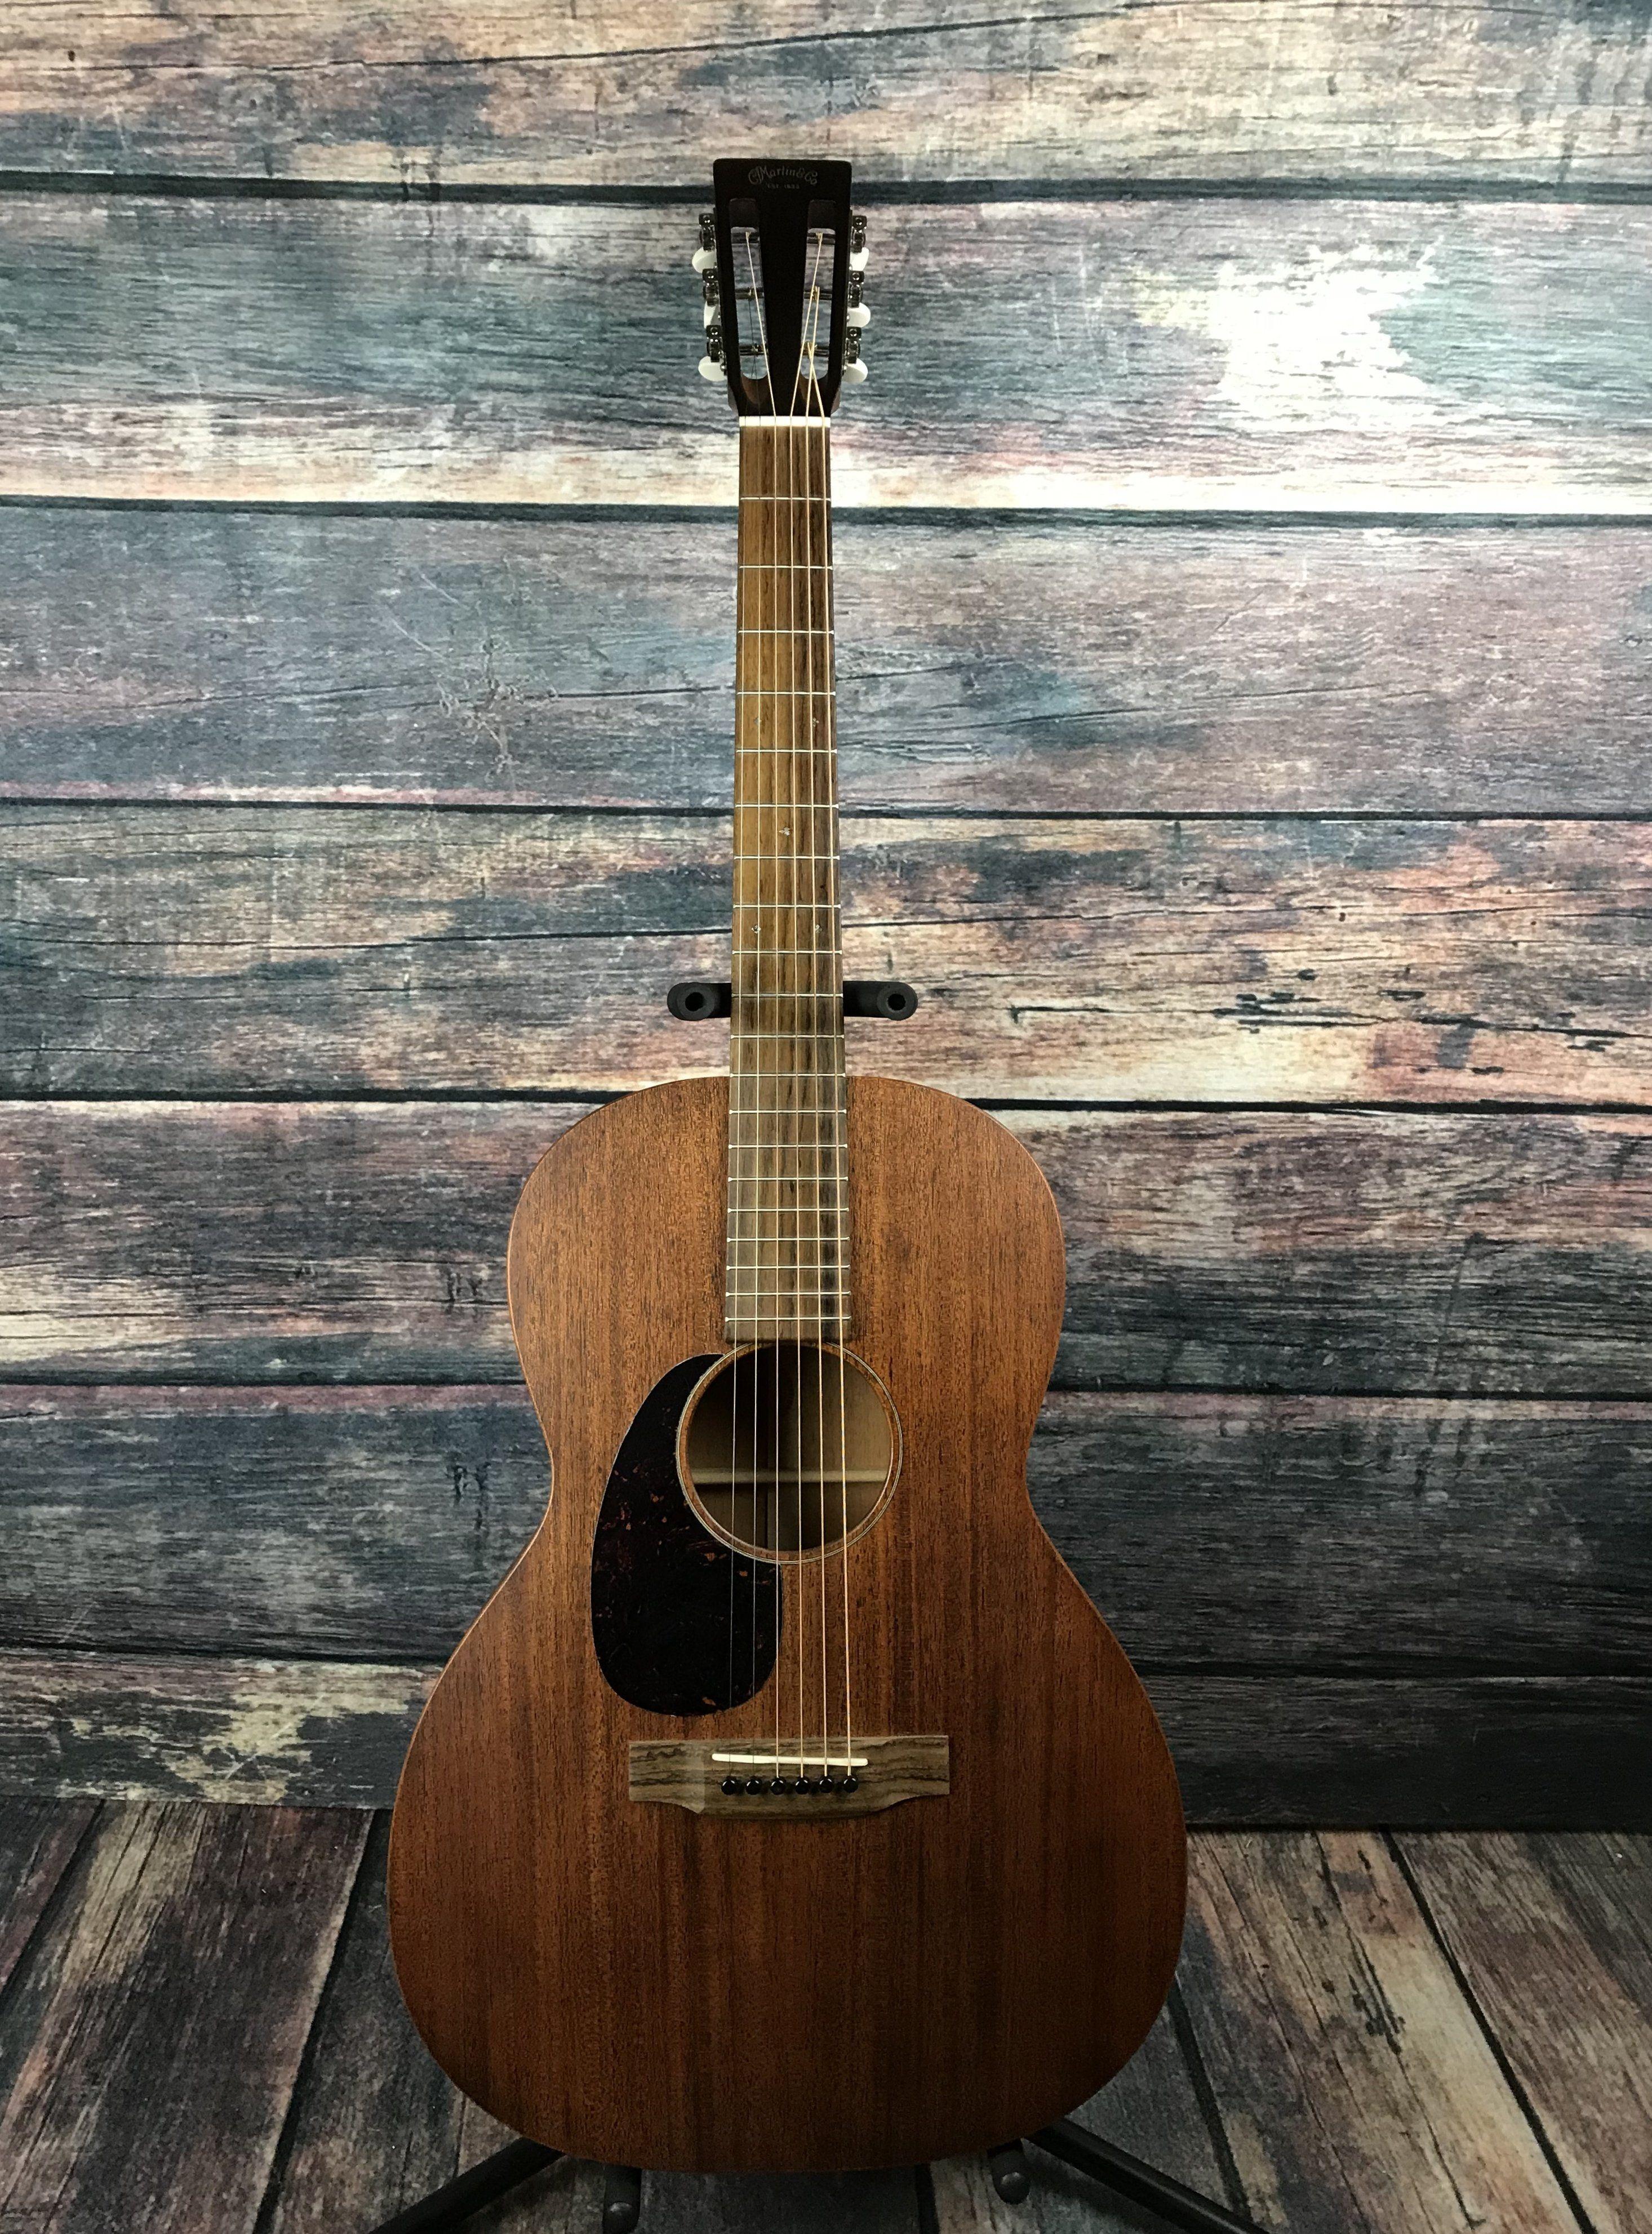 Used Martin Left Handed 000 15sm Acoustic Guitar With Case Acoustic Electric Guitar Acoustic Electric Guitar